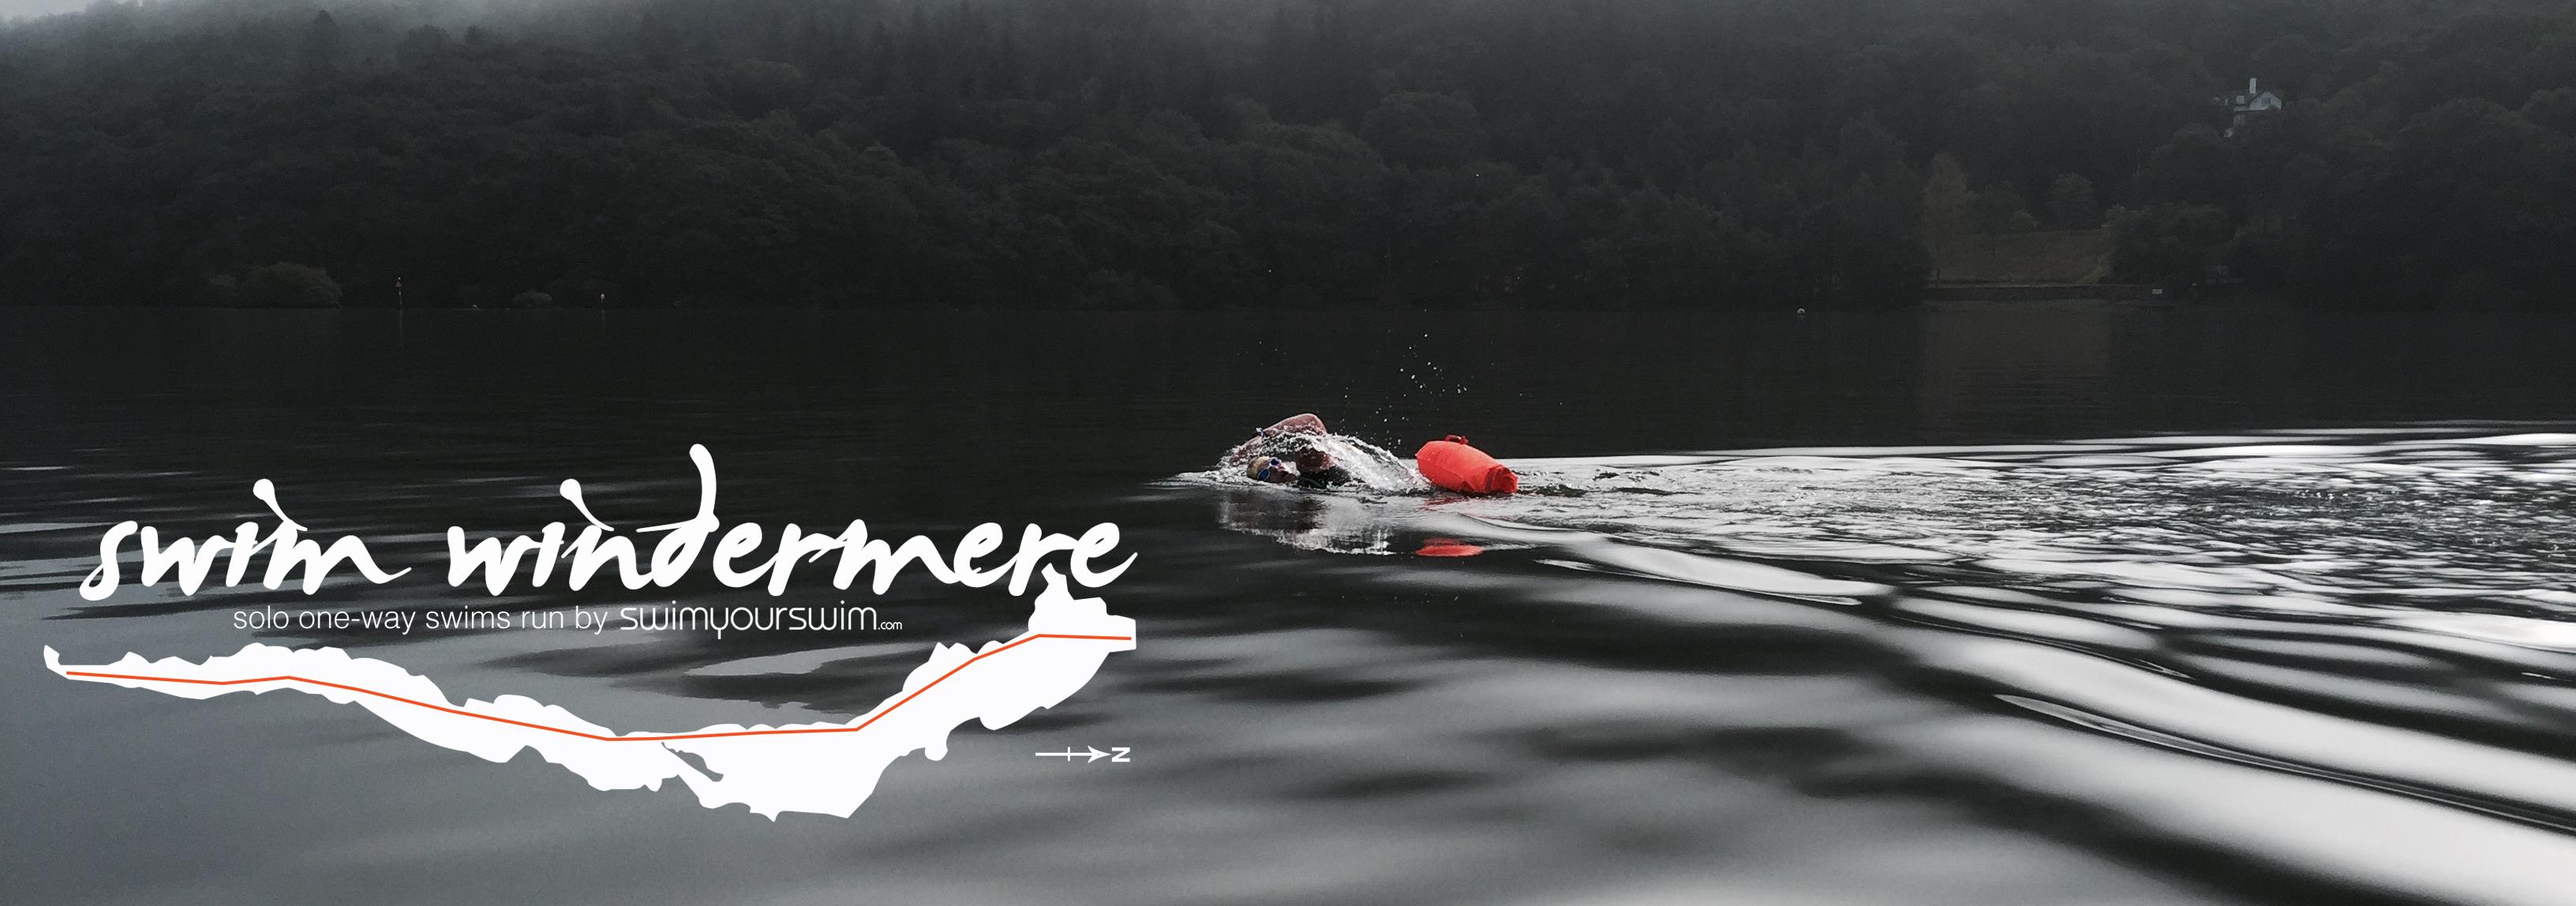 swimwindermere-solo-image